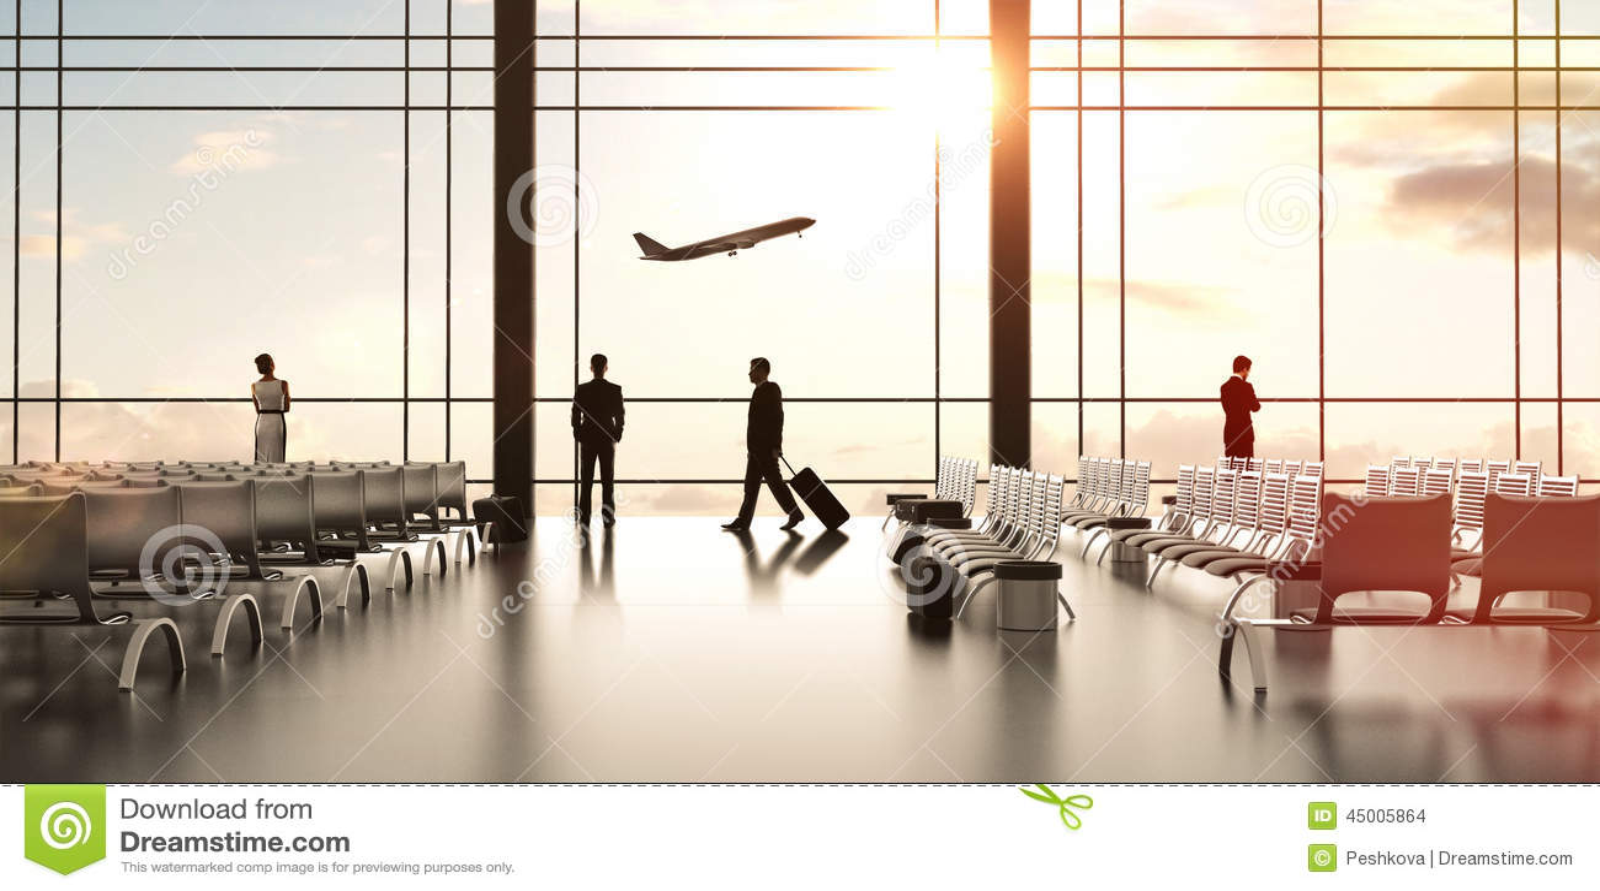 Aeroporto com povos